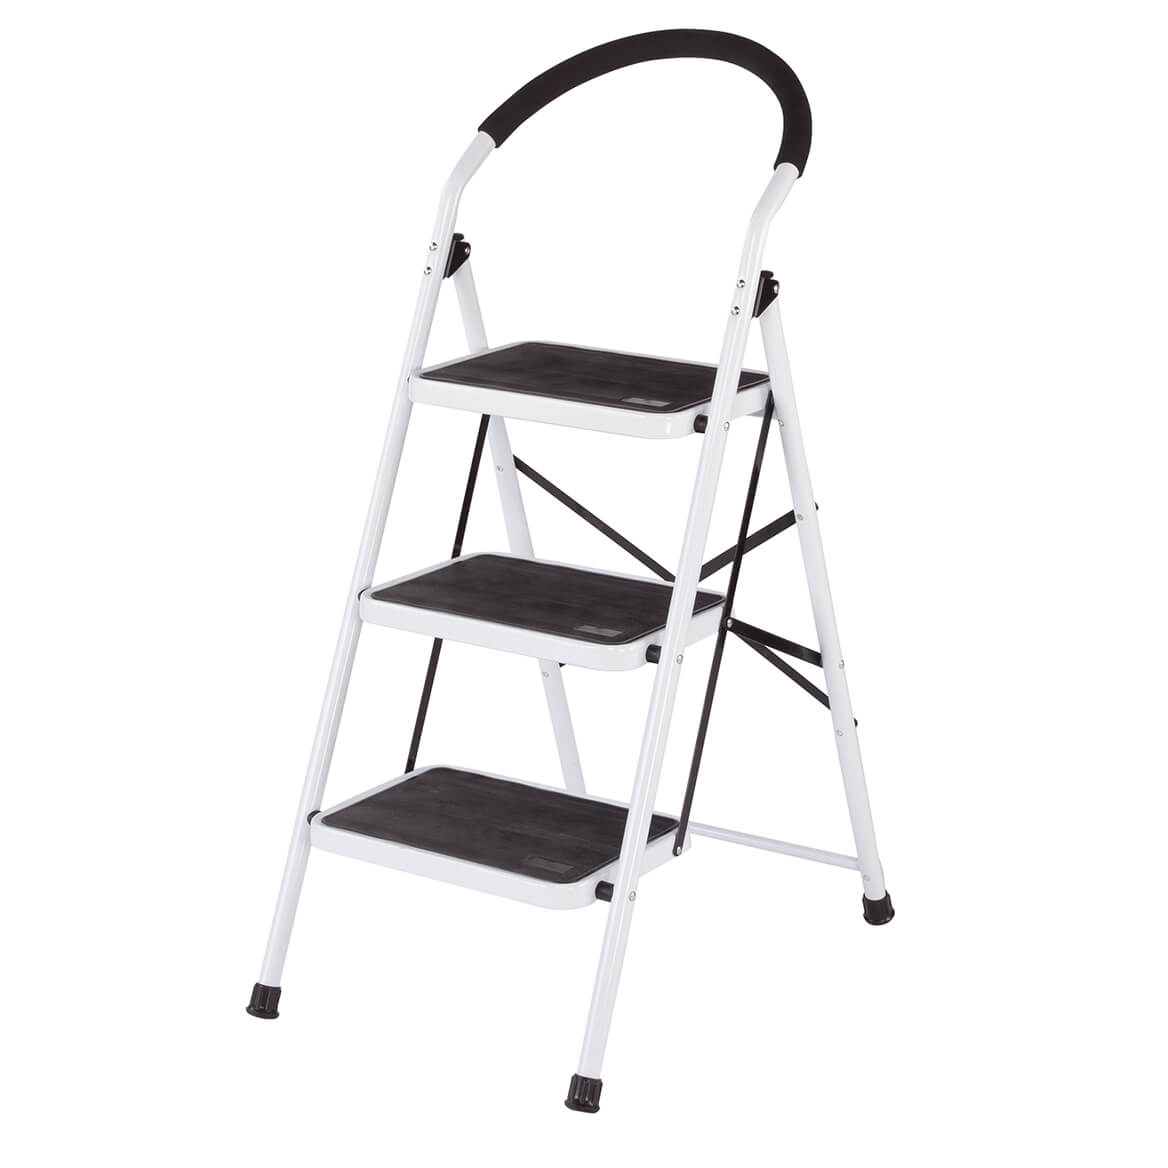 3 Step Ladder Stool Combo With Handgrip Anti Slip